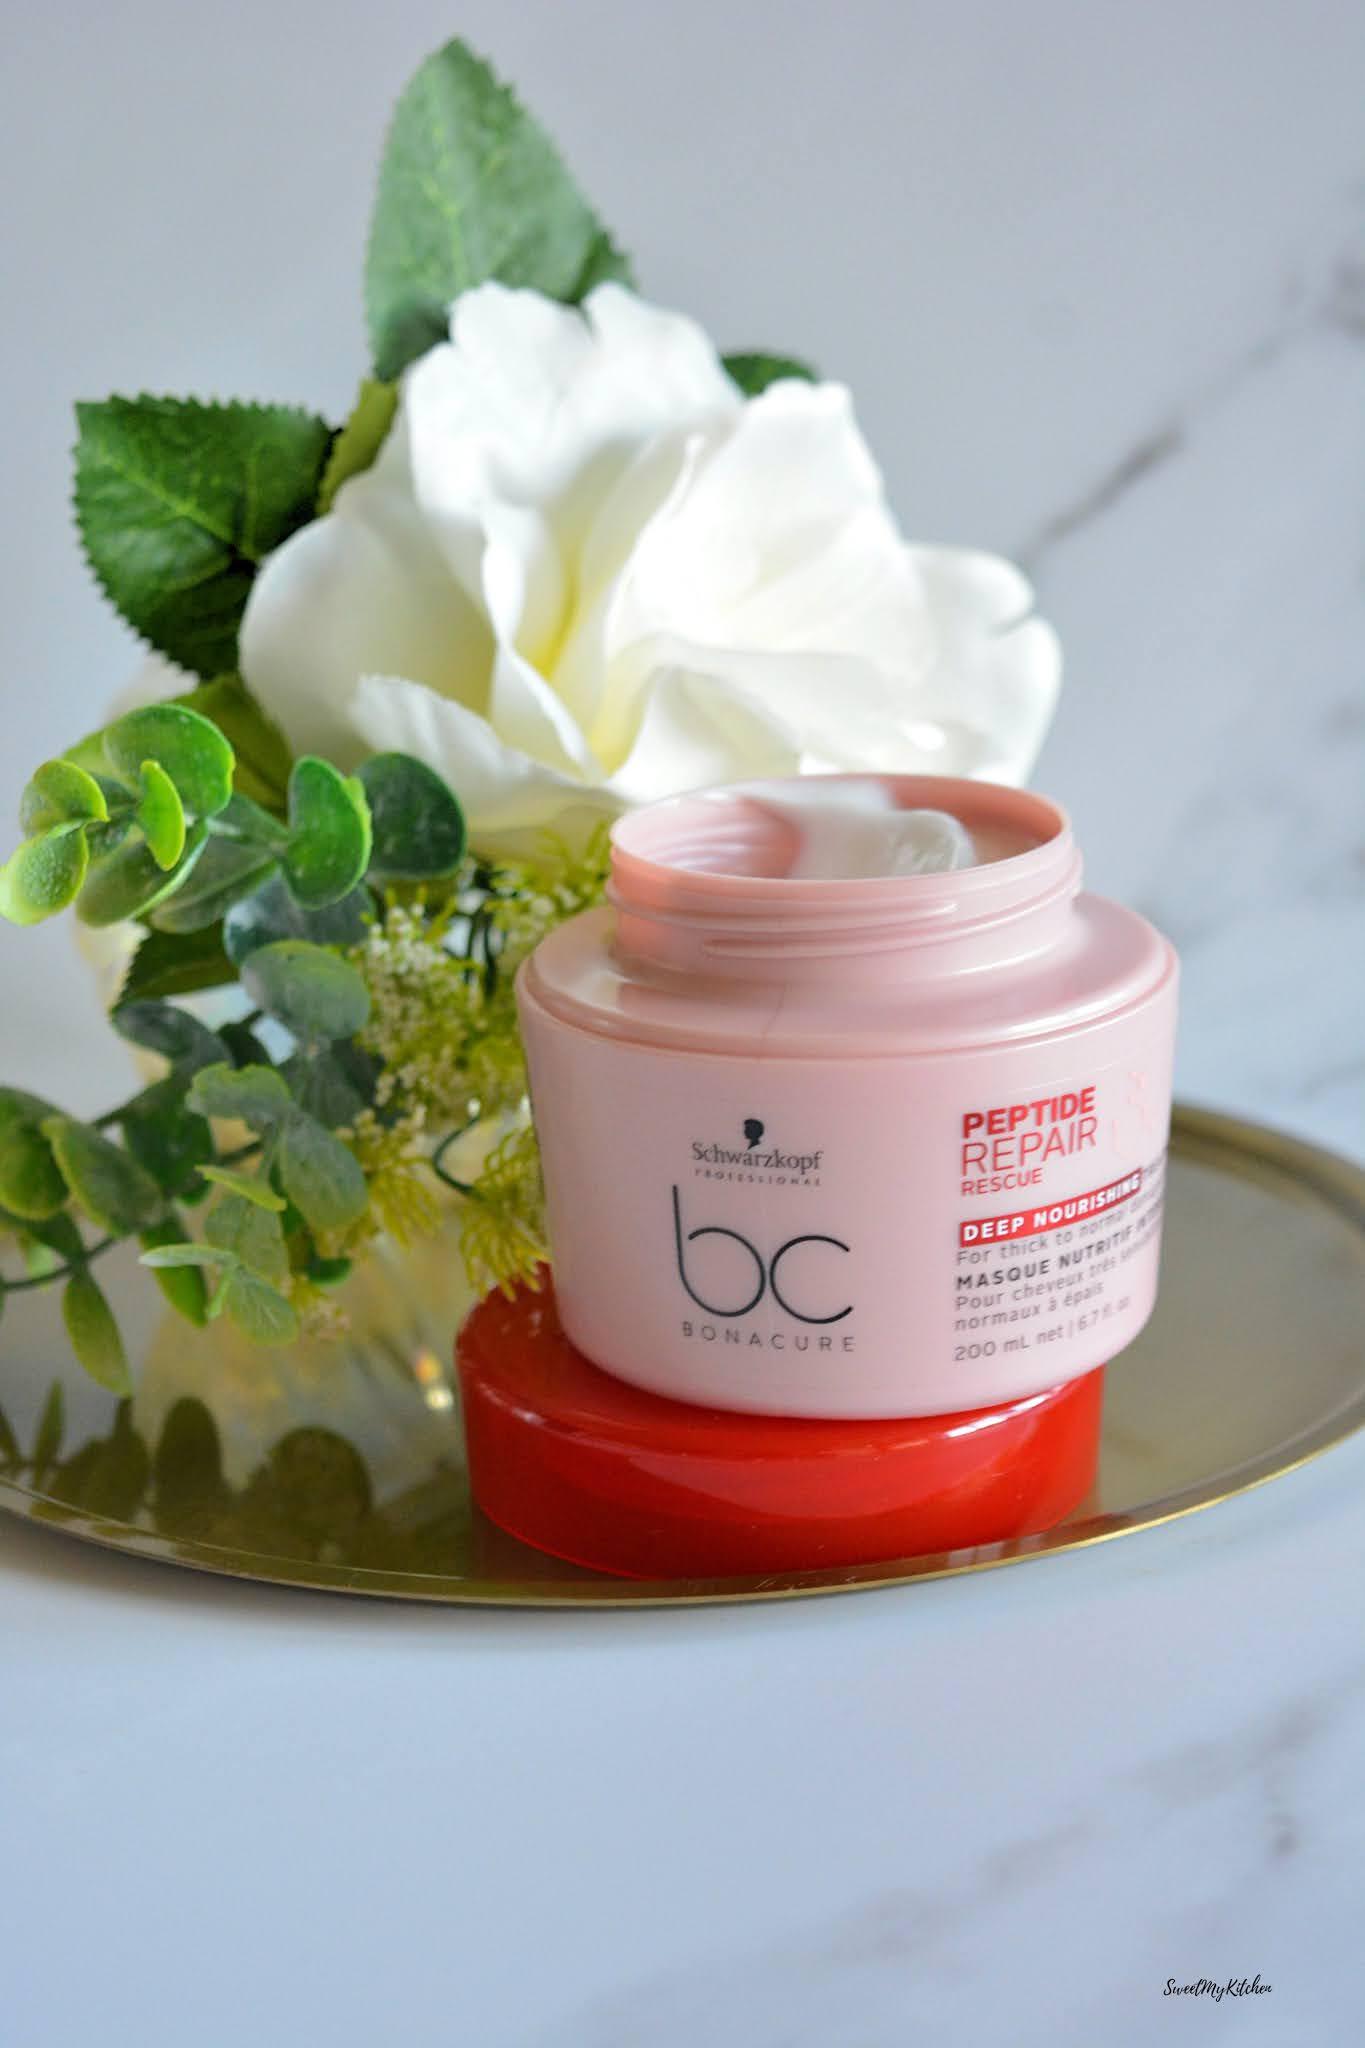 BC Bonacure Peptide Repair Rescue hair mask deep nourishing